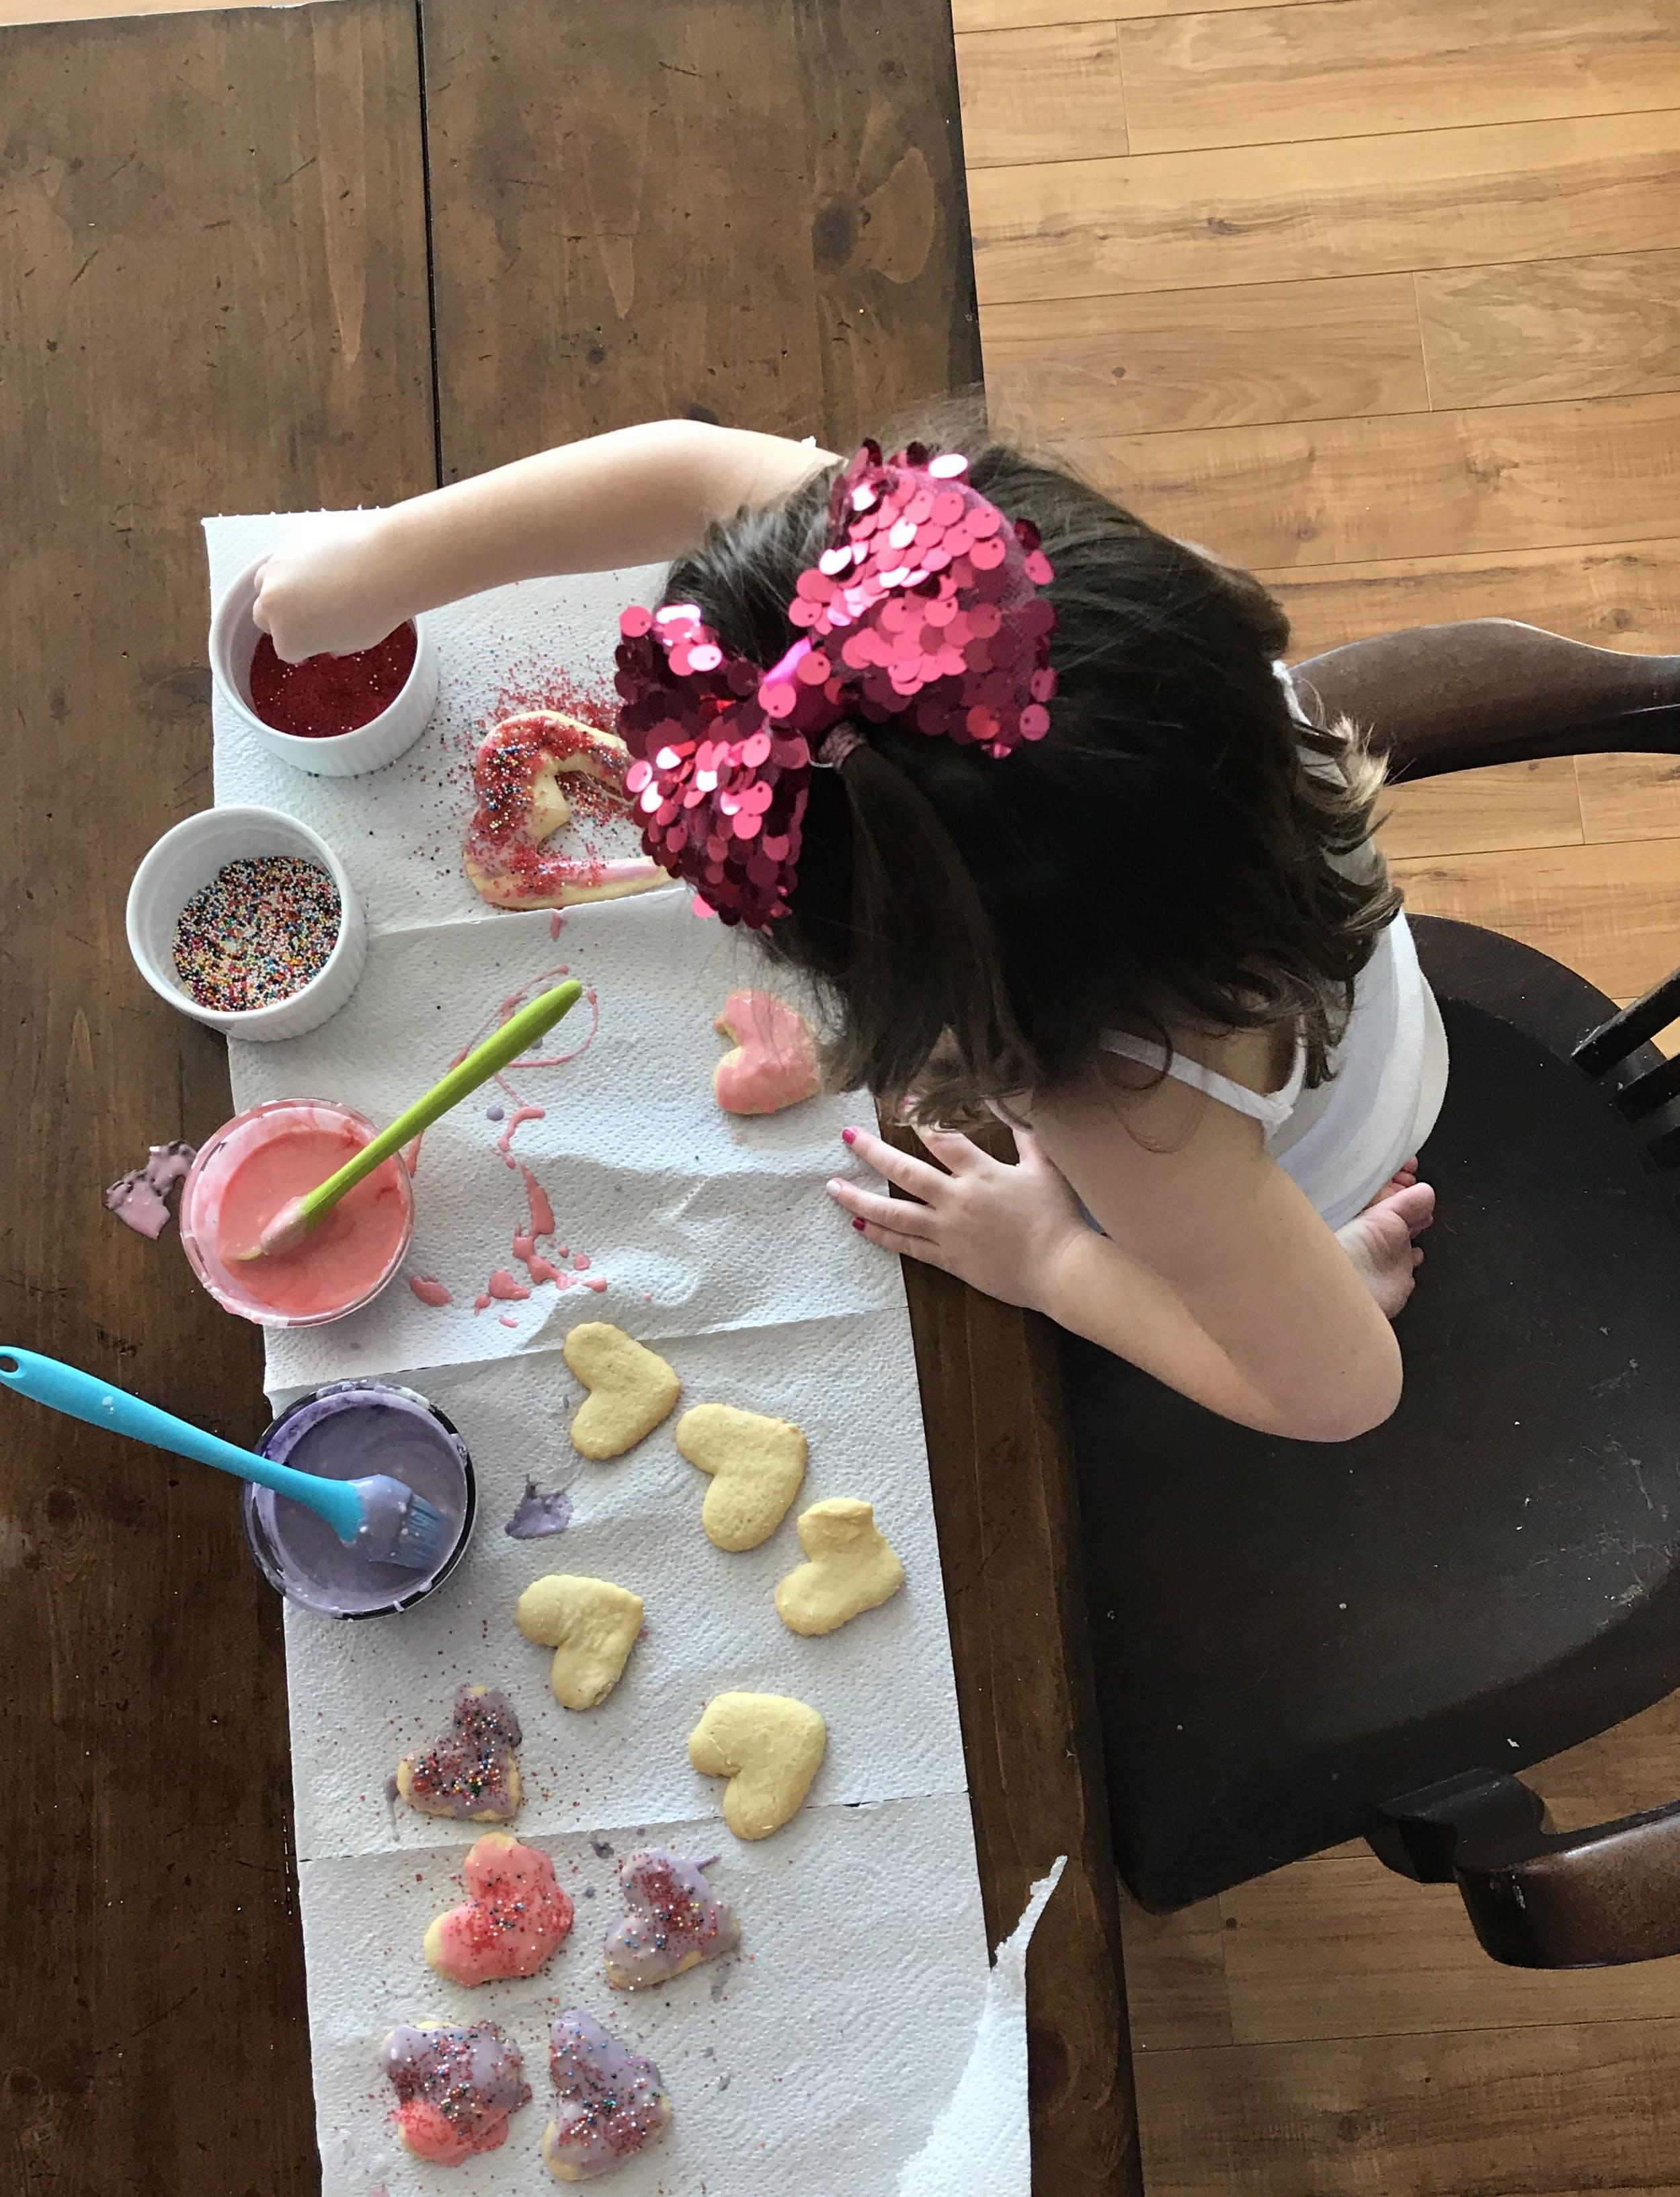 Free stock photo of heart, girl, purple, table